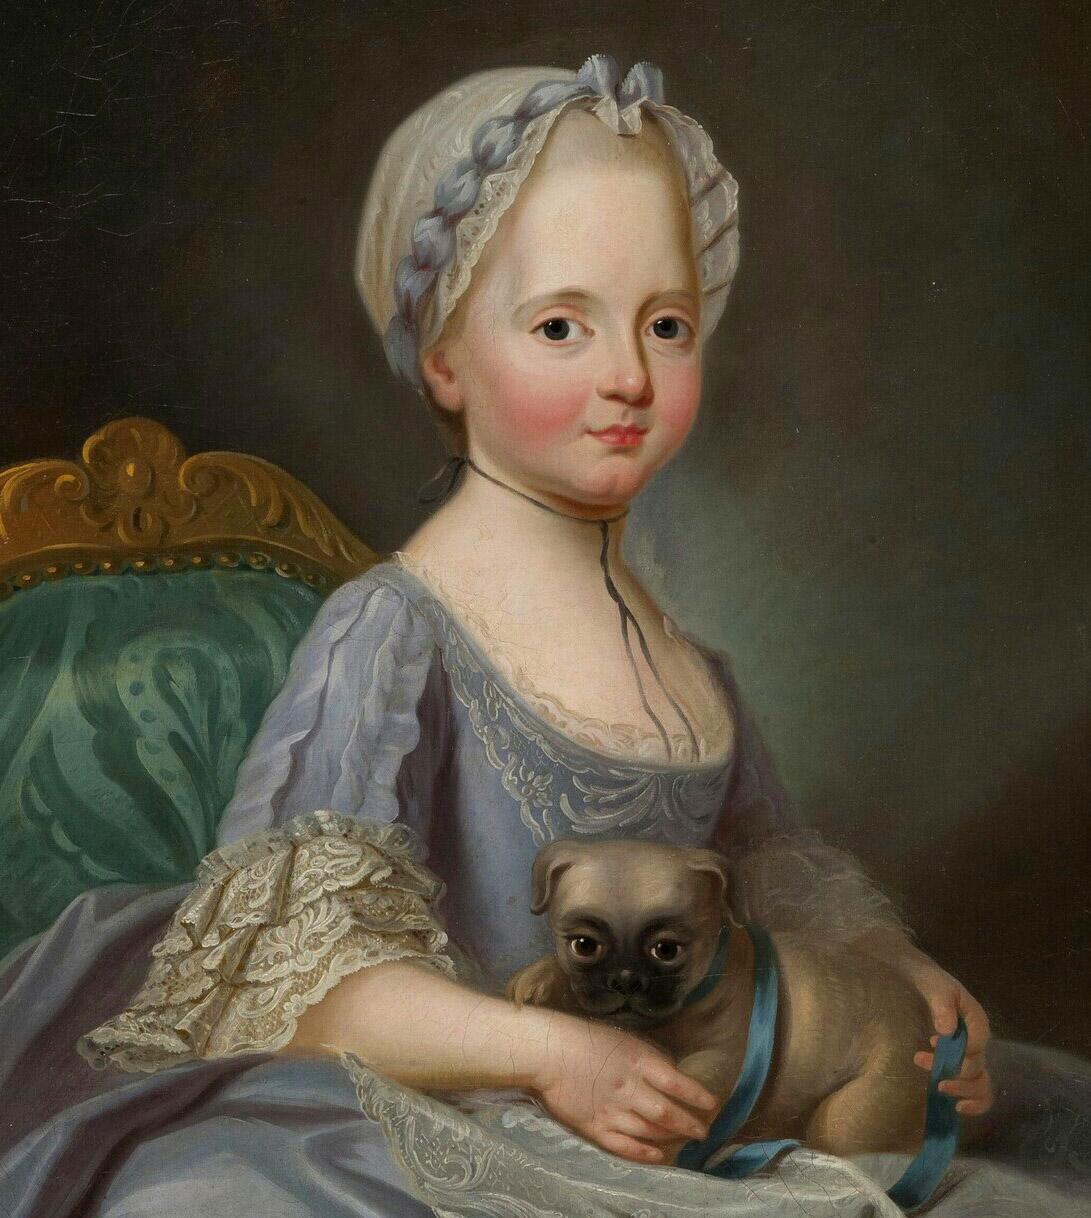 Joseph Ducreux. Madame Élisabeth. 1768. Palacio de Versalles.